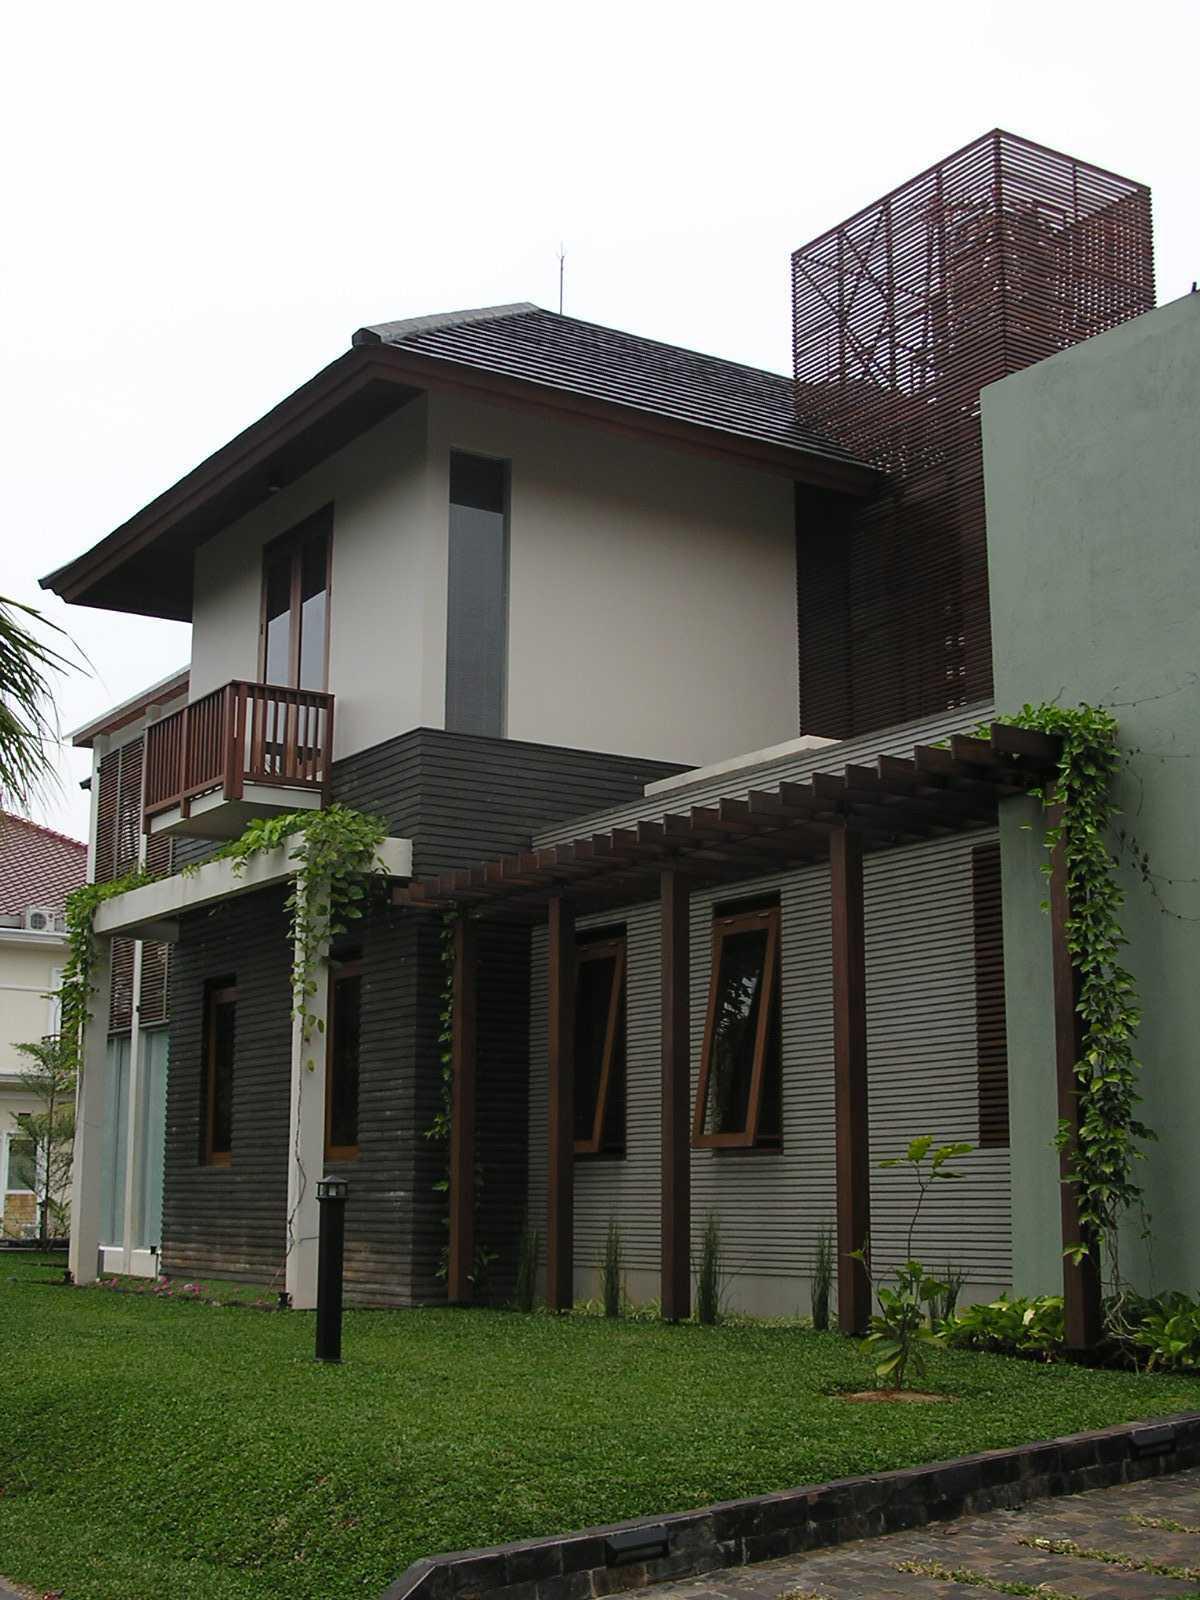 Pt. Garisprada Bintaro Residence Bintaro, Pesanggrahan, South Jakarta City, Jakarta, Indonesia Bintaro P1145553 Tropis  22382